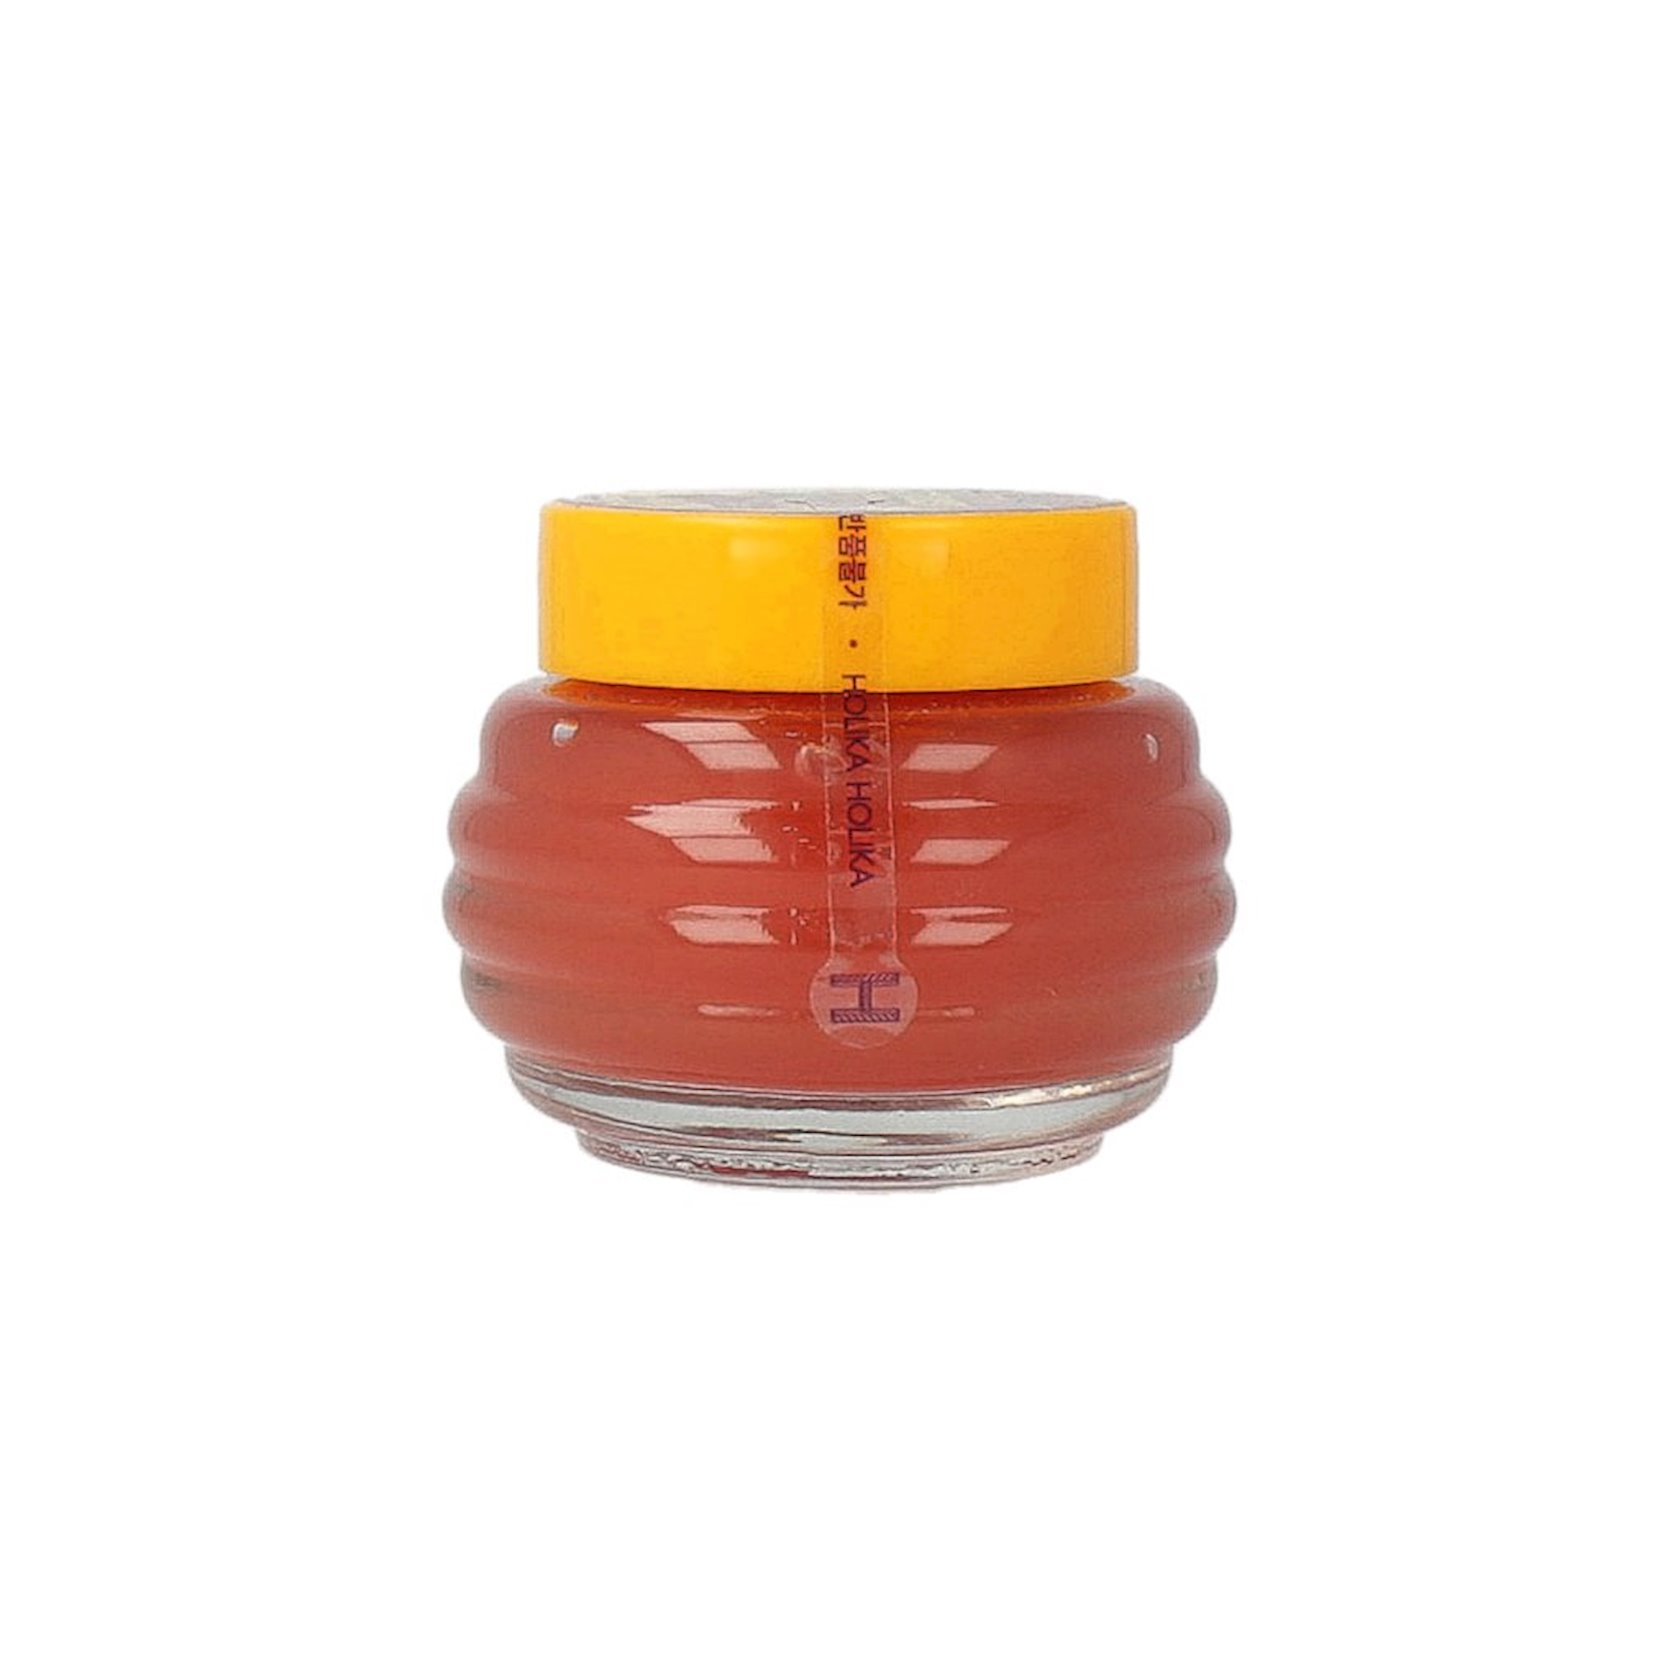 Ballı gecə maskası Holika Holika Honey Sleeping Pack Acerola, 90 ml